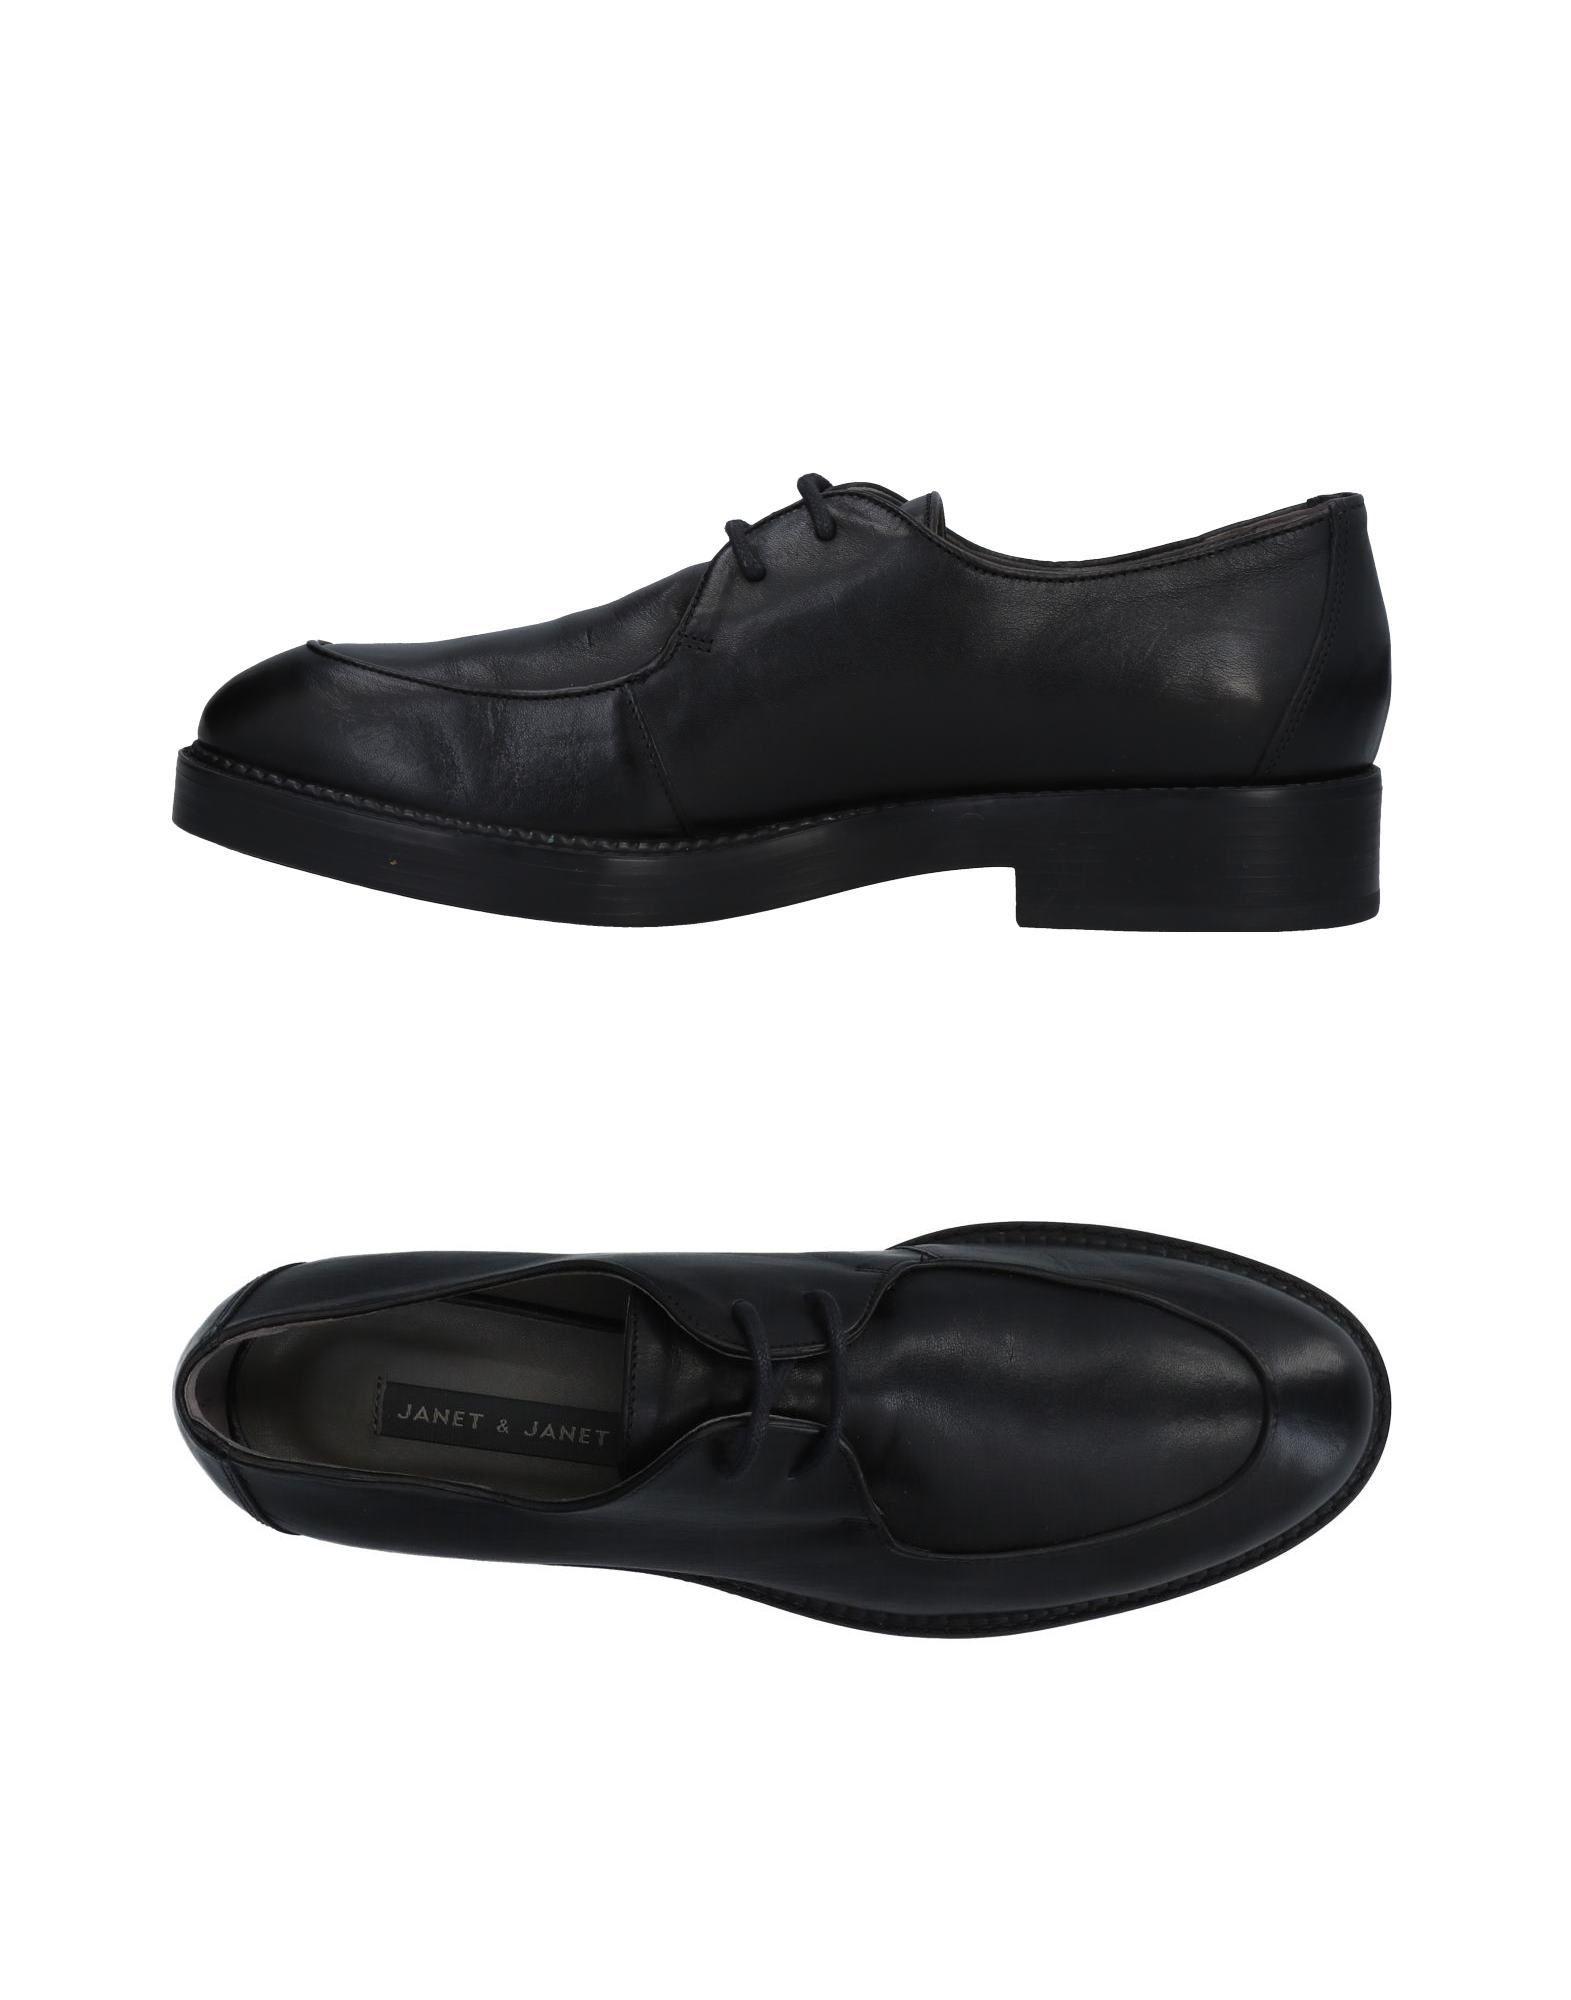 Фото - JANET & JANET Обувь на шнурках обувь на высокой платформе dkny